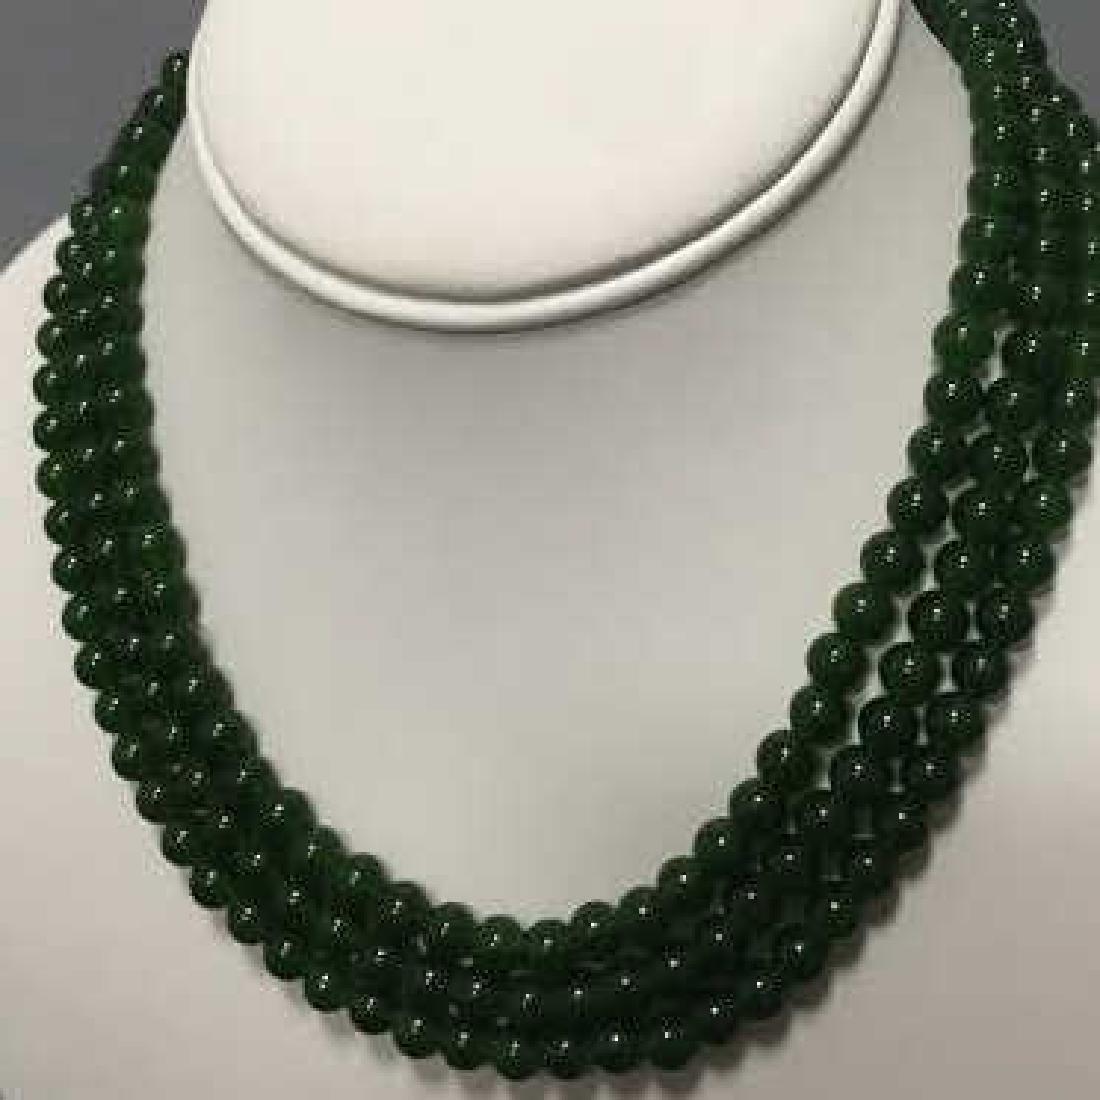 Three Chinese Green Jade Round Bead Necklaces - 4